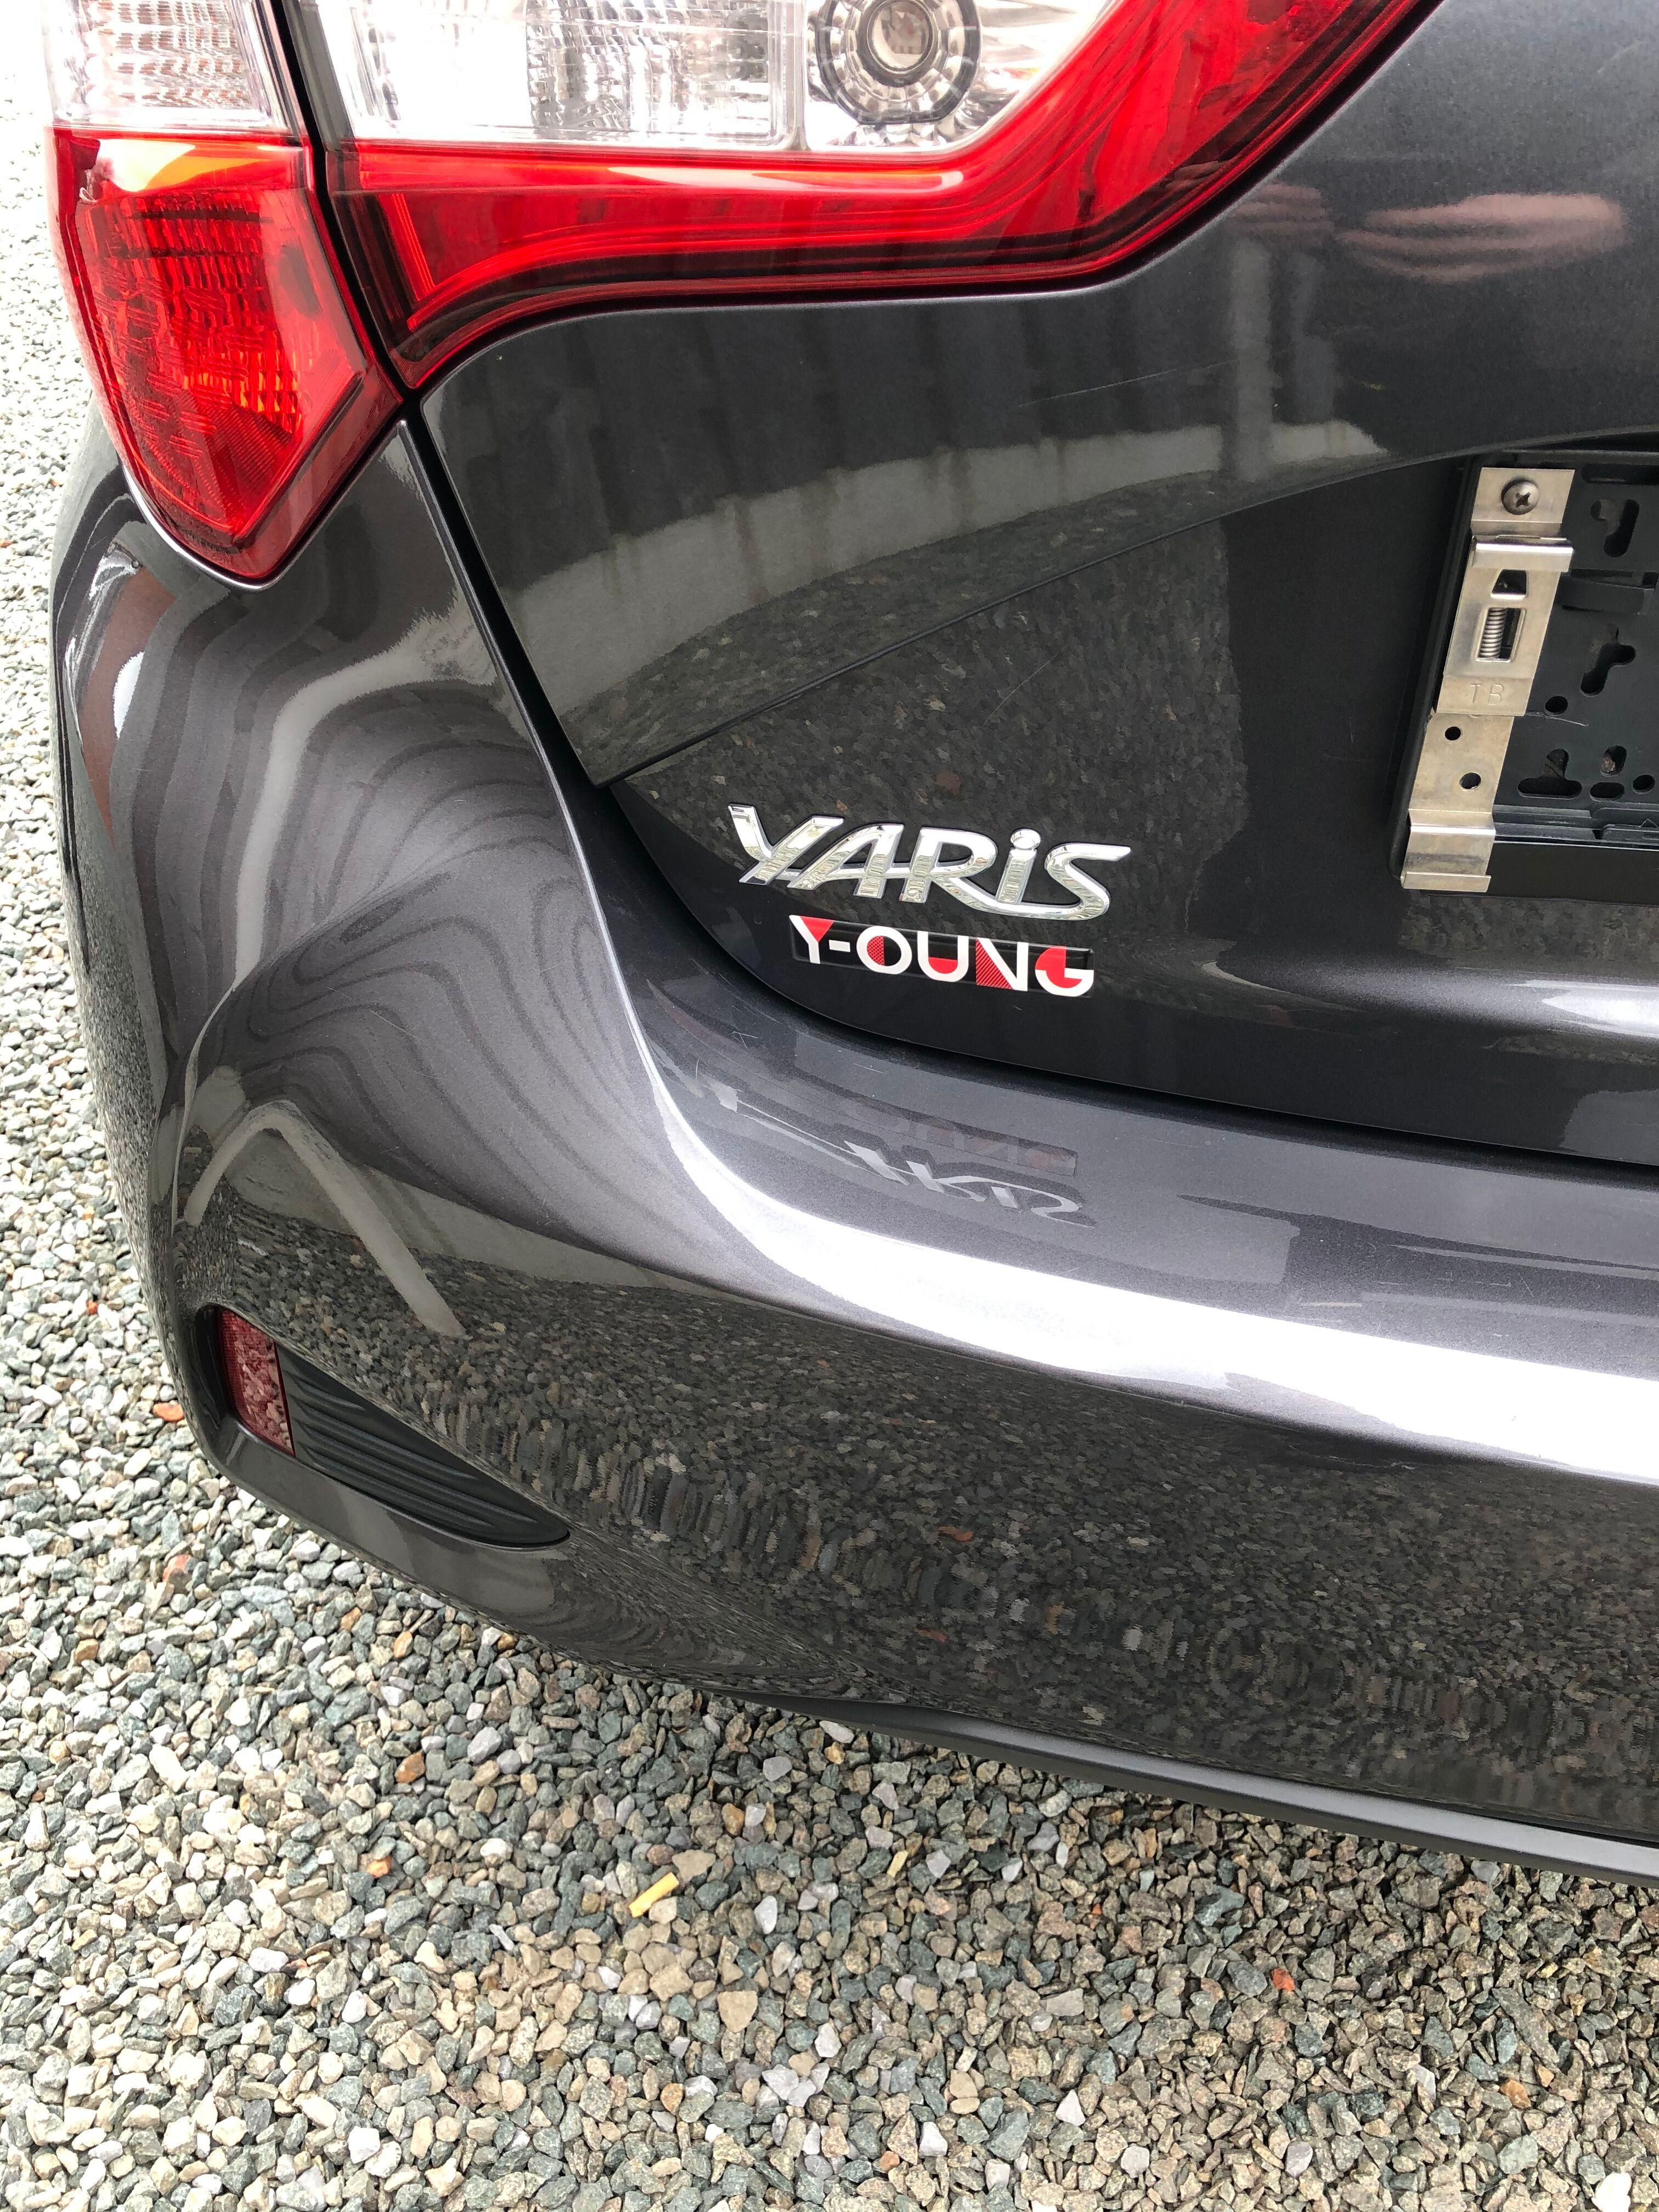 Toyota Yaris young 9/9